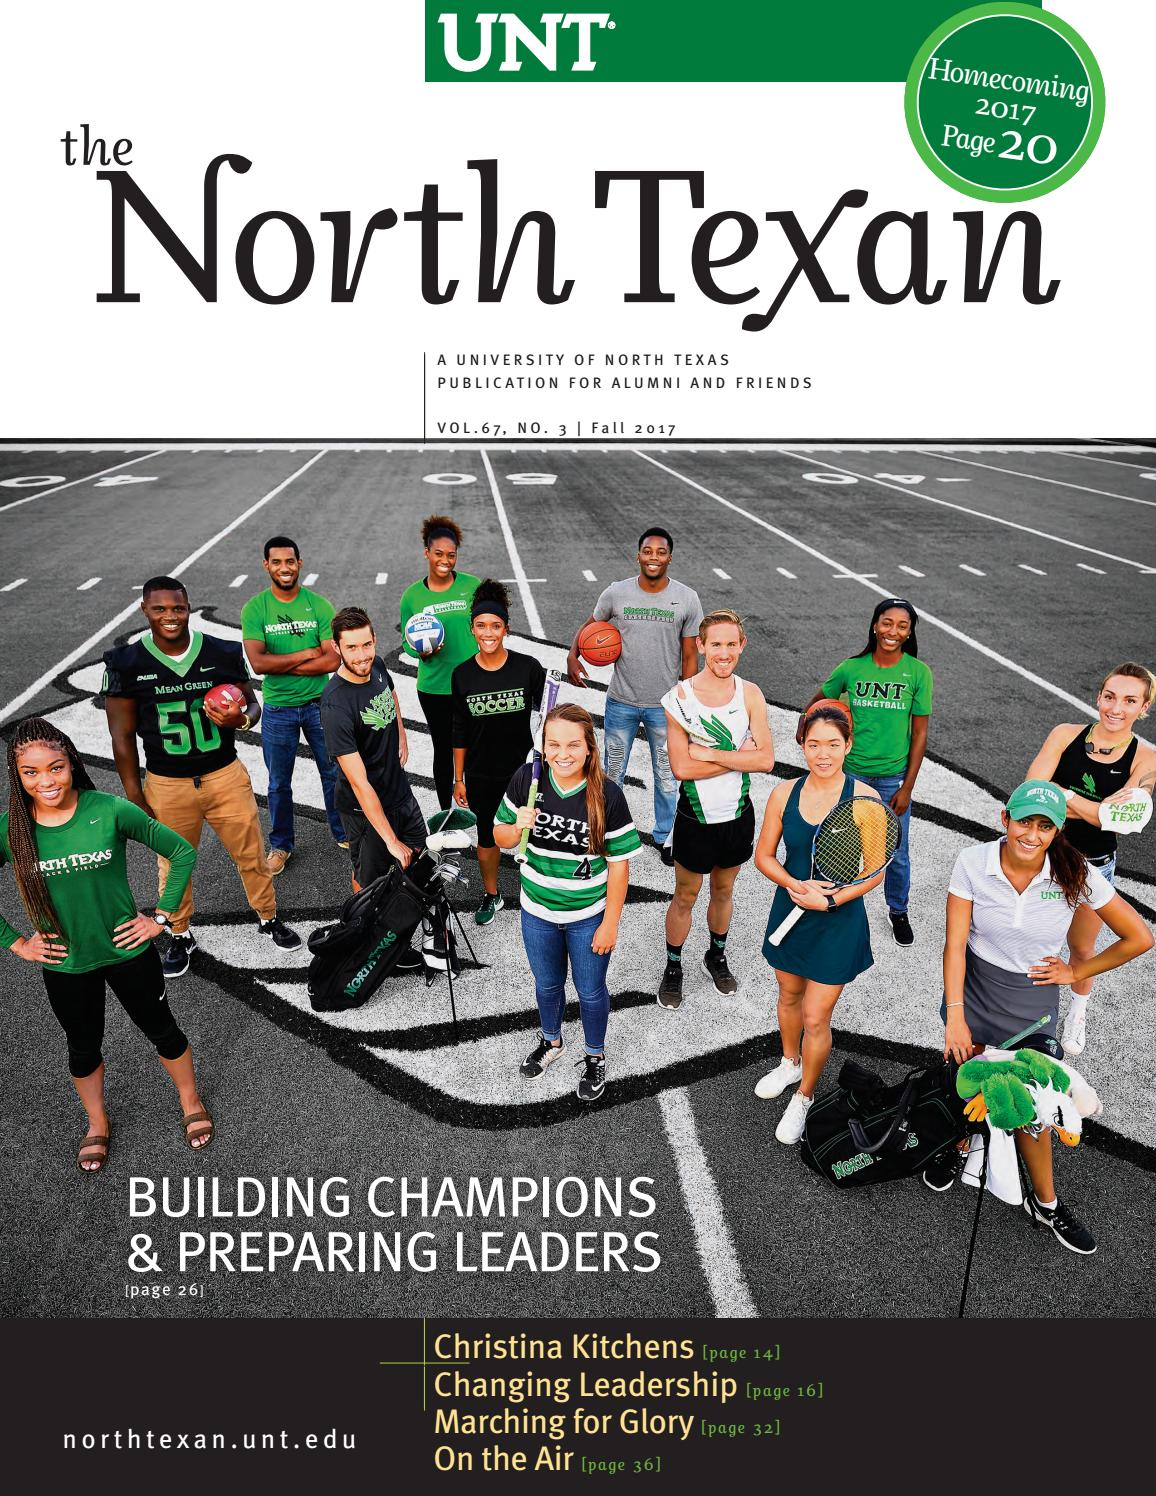 The North Texan - UNT Alumni Magazine - Fall 2017 by University of North Texas - issuu